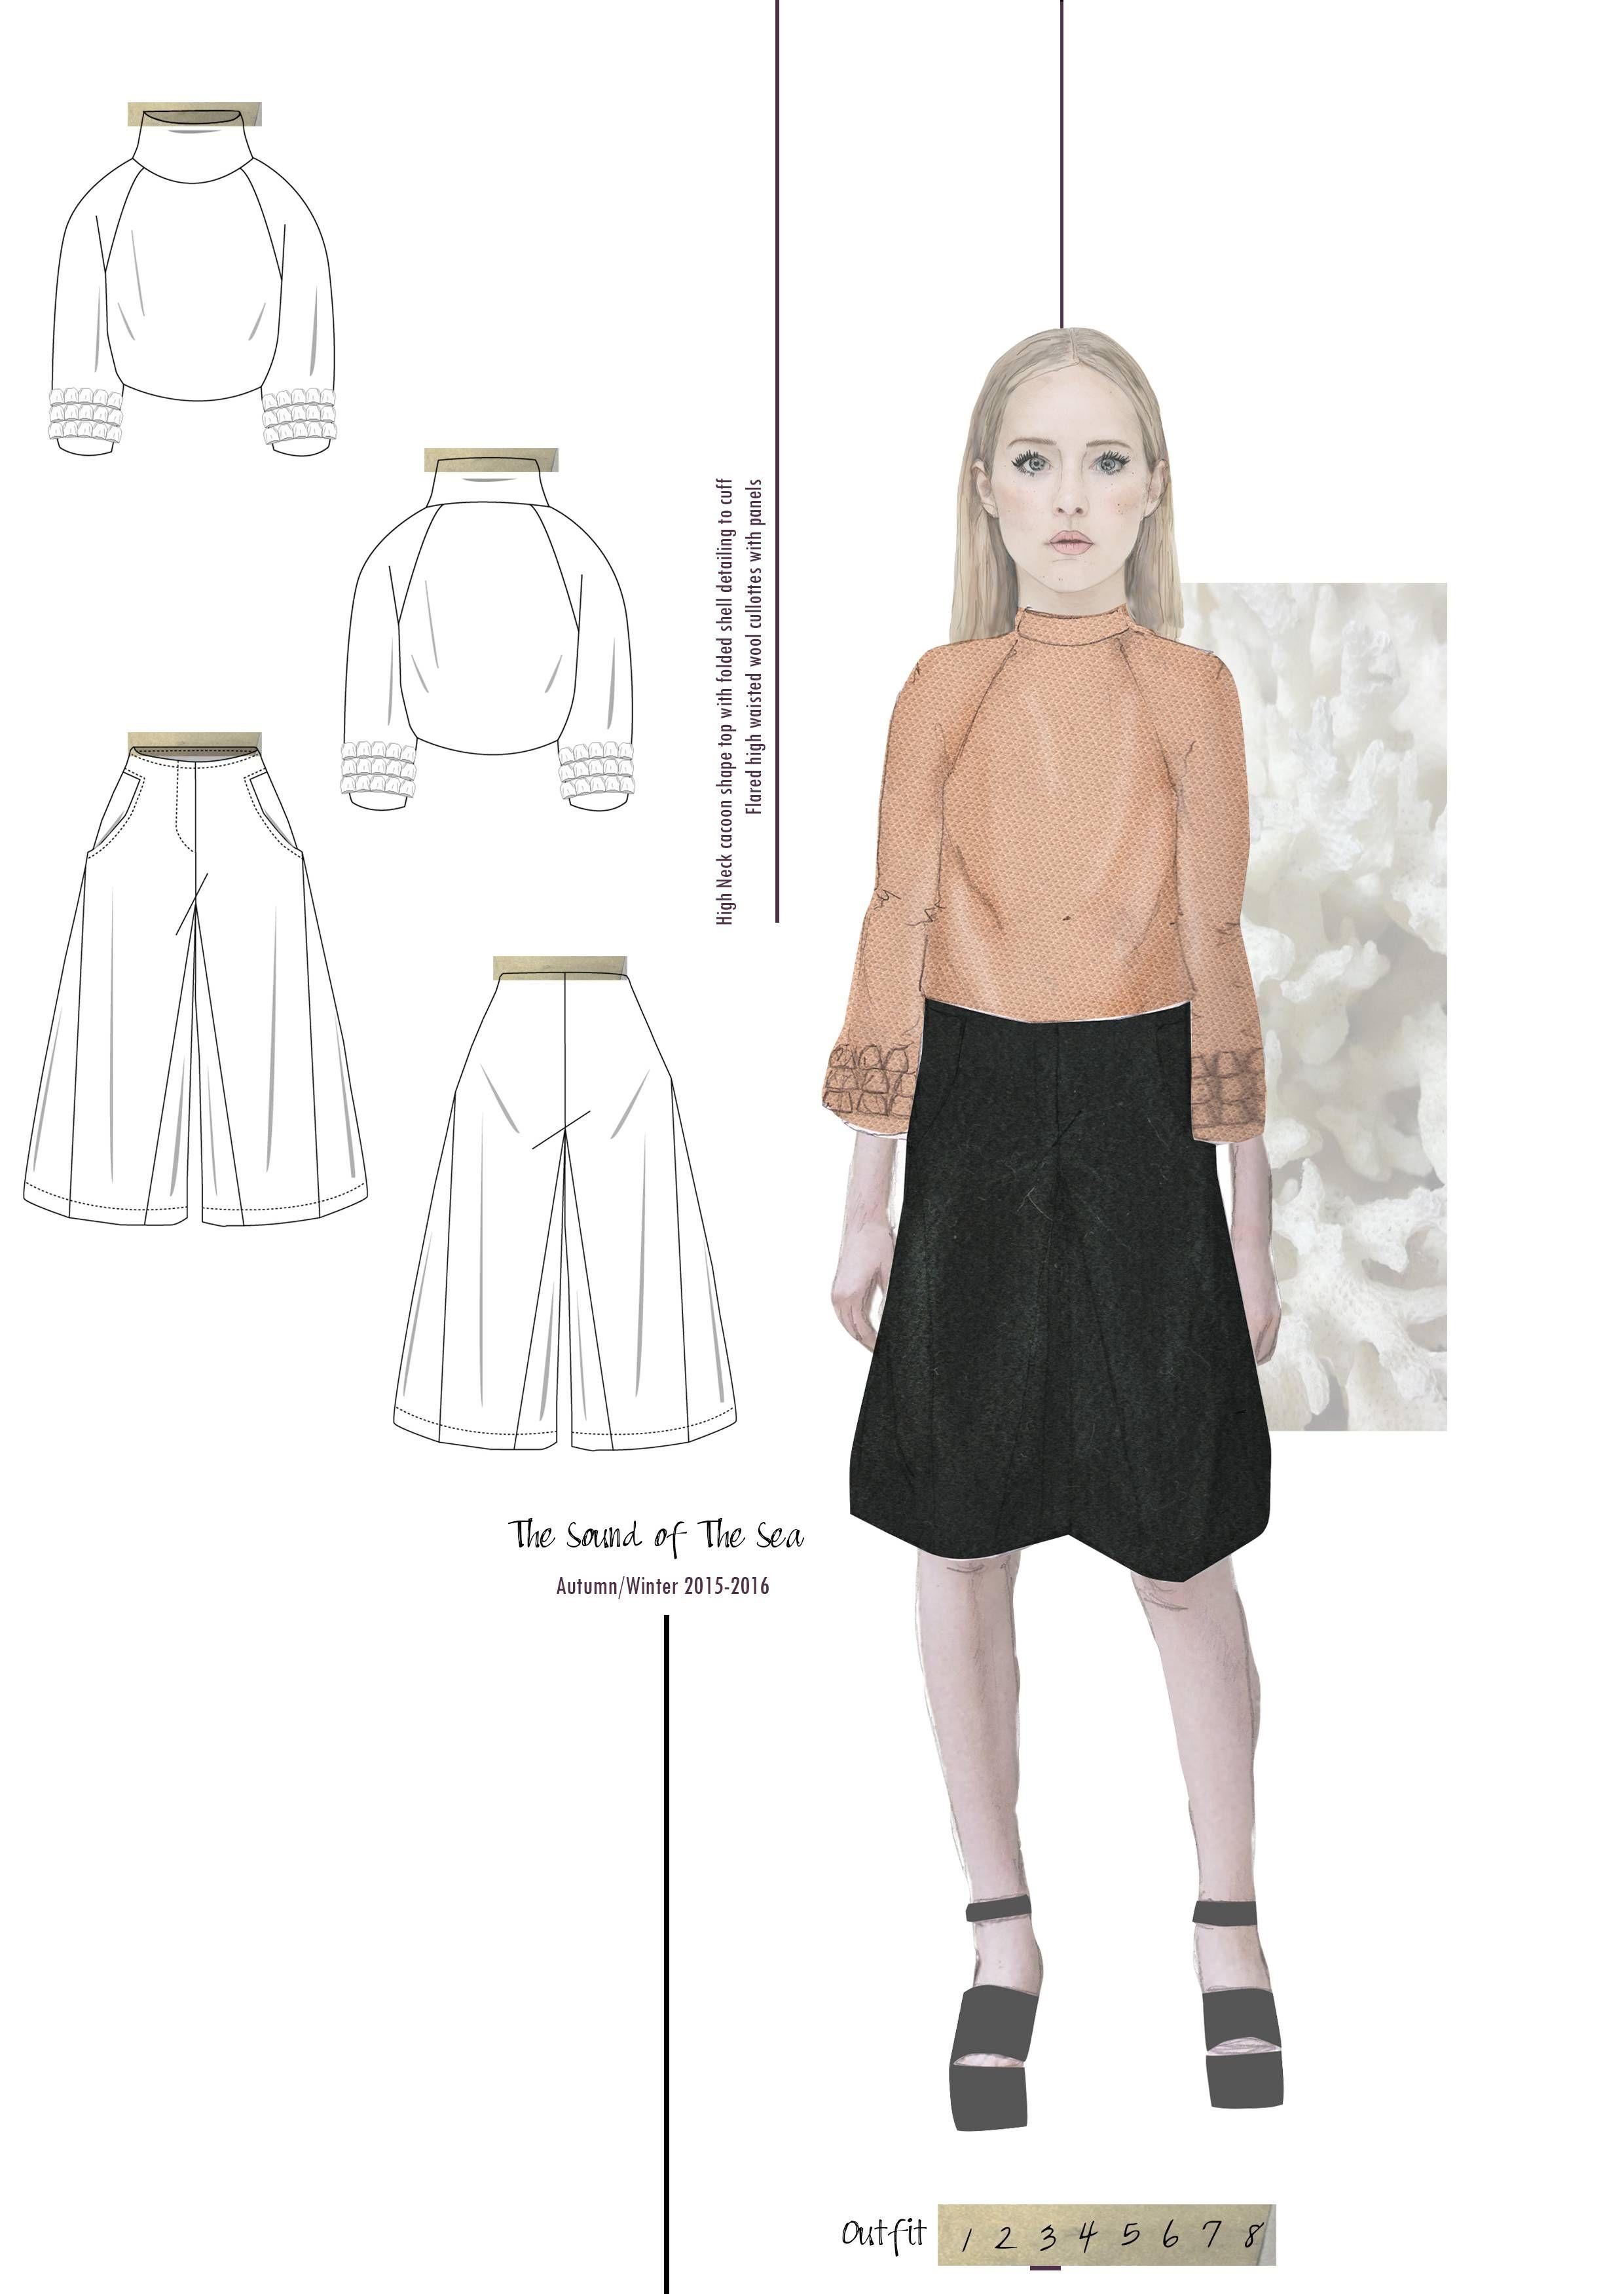 Fashion Sketchbook - fashion illustration; fashion design drawings; fashion portfolio // Emily Burnett